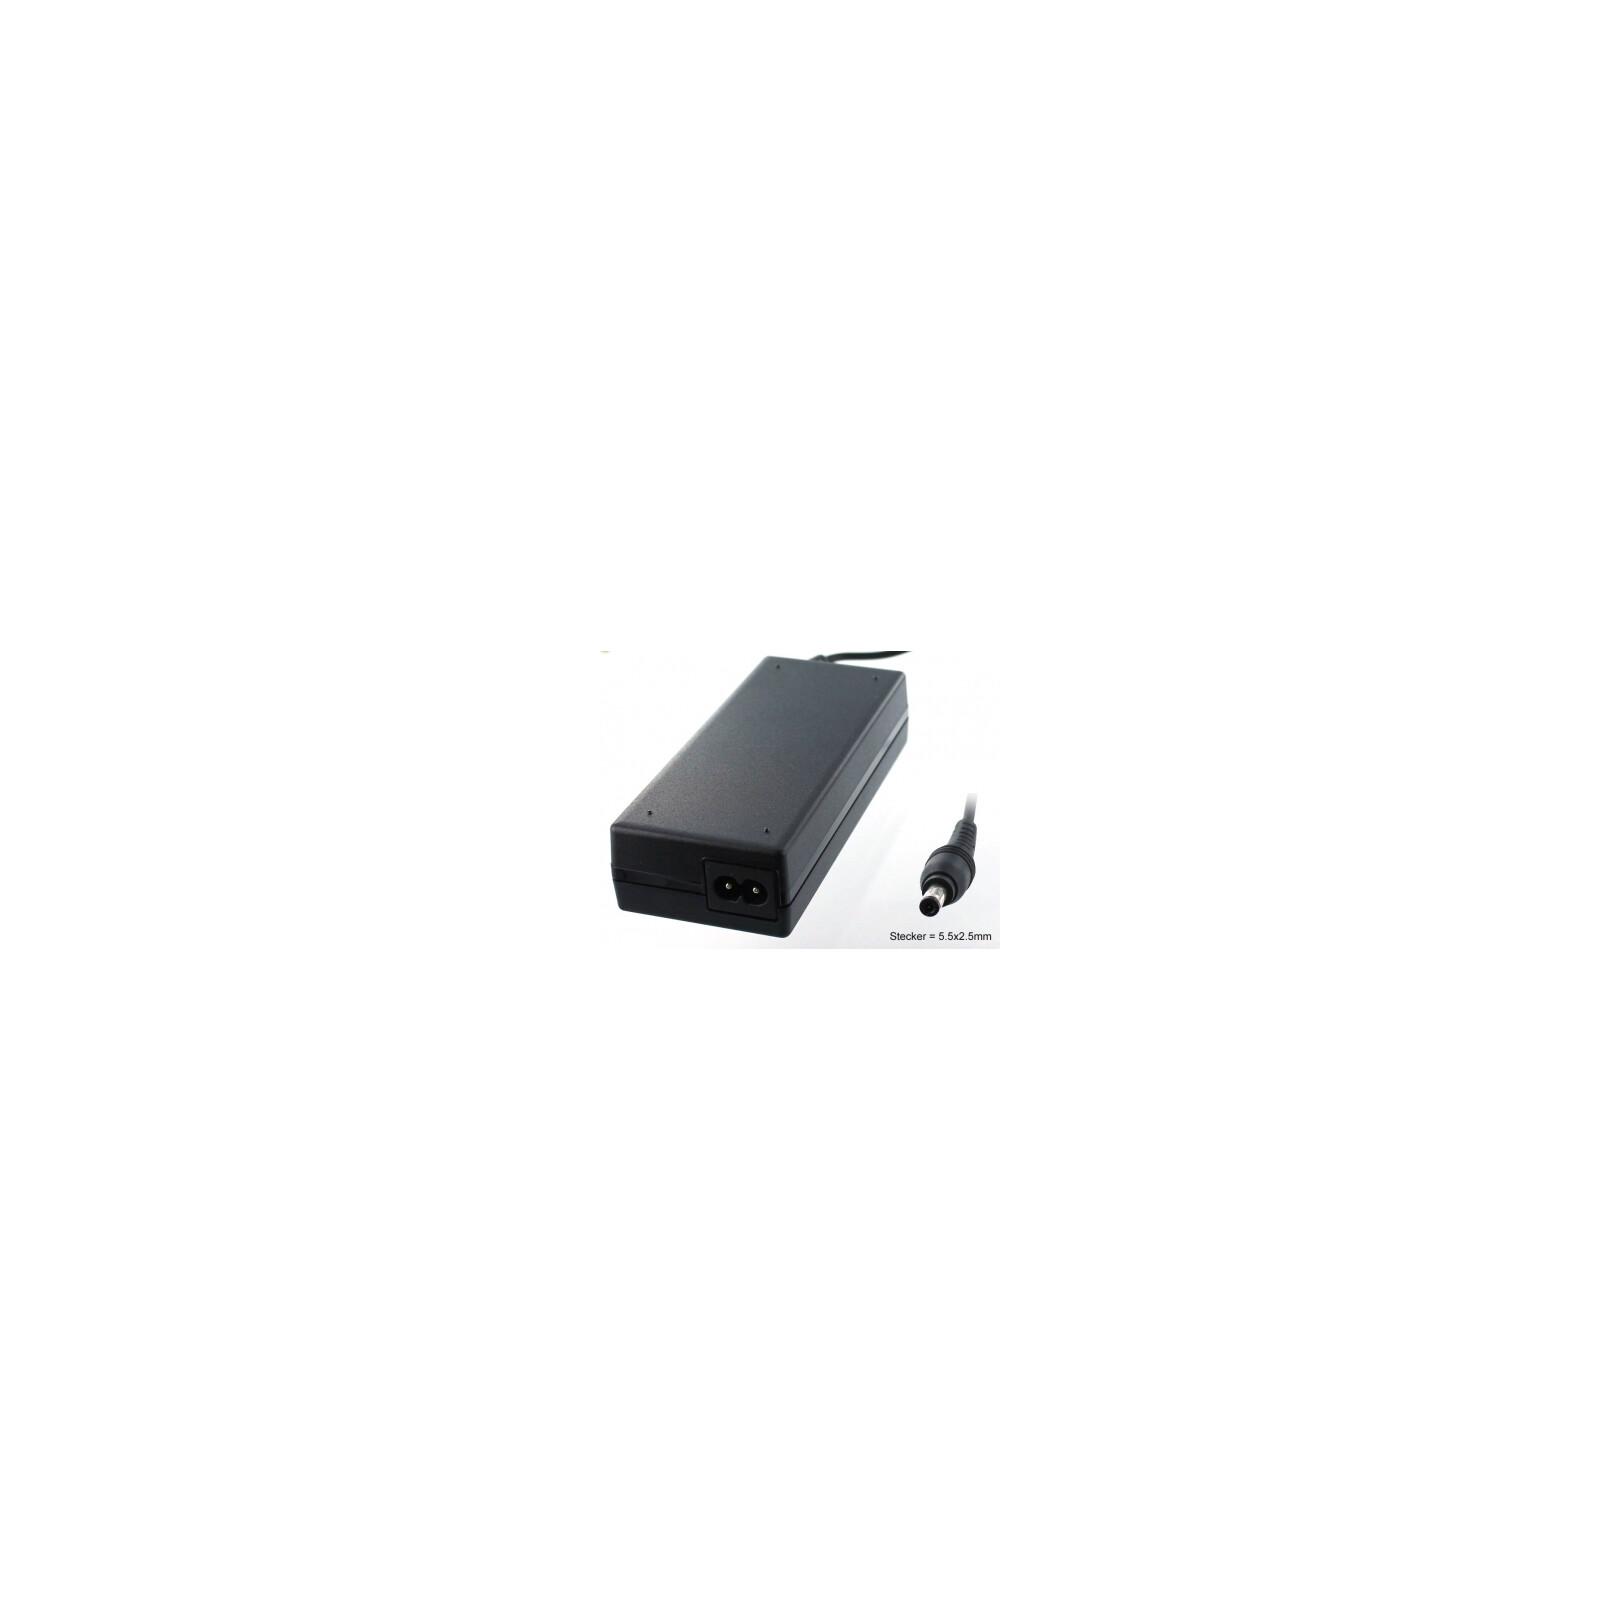 AGI Netzteil HP Compaq NX9000 90W